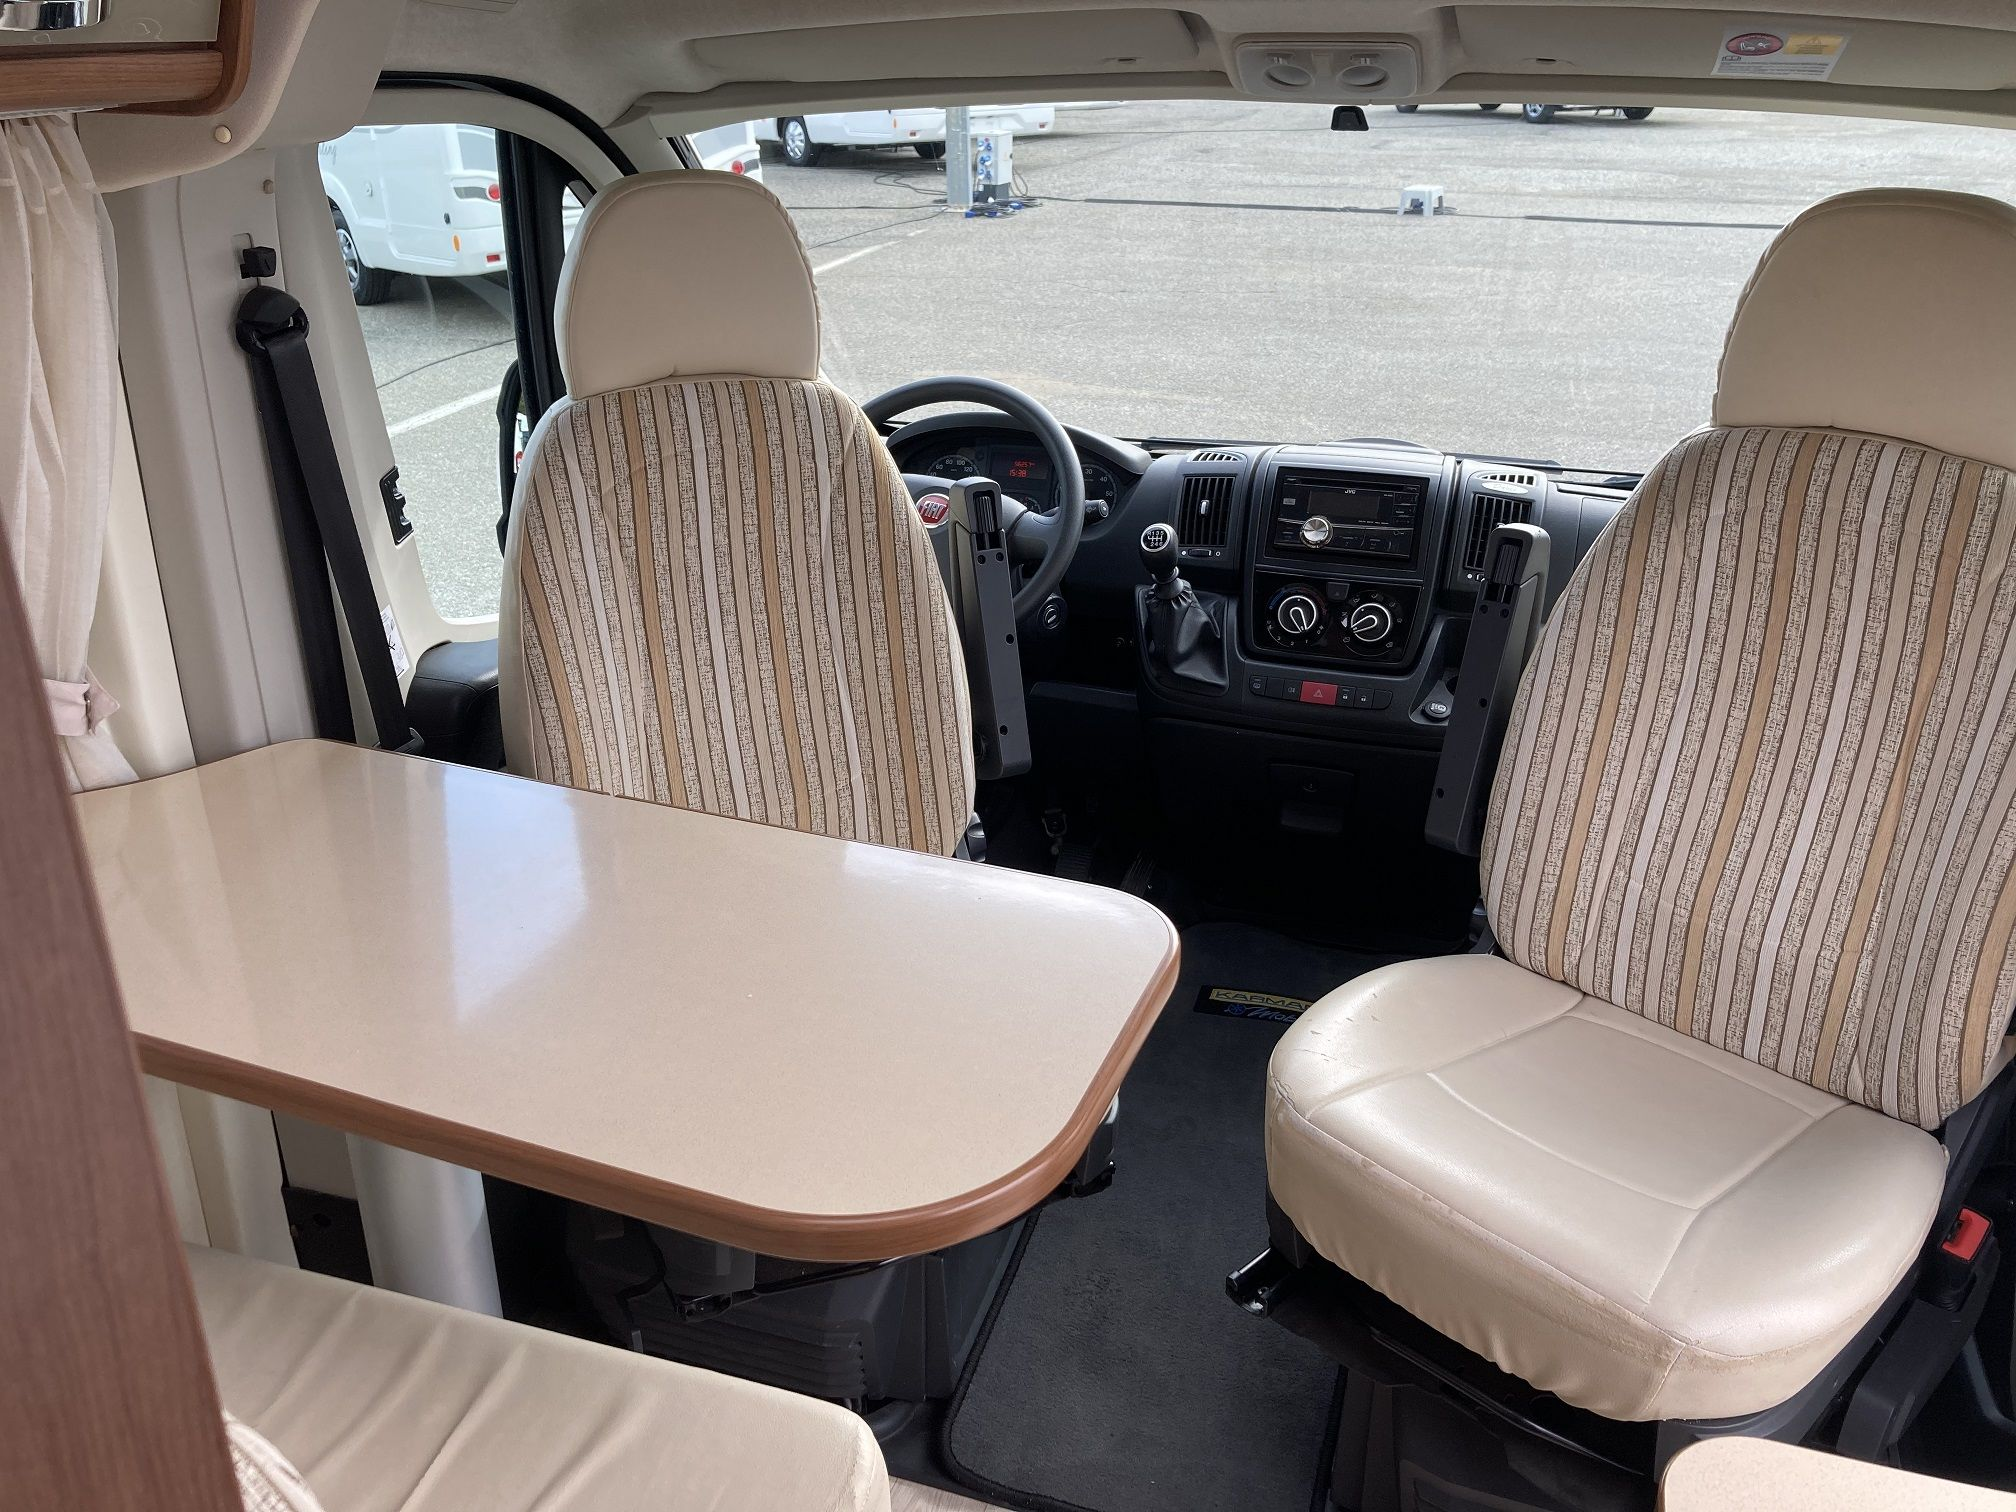 Frontal interior del modelo Karmann de Autocaravanas Bilbao